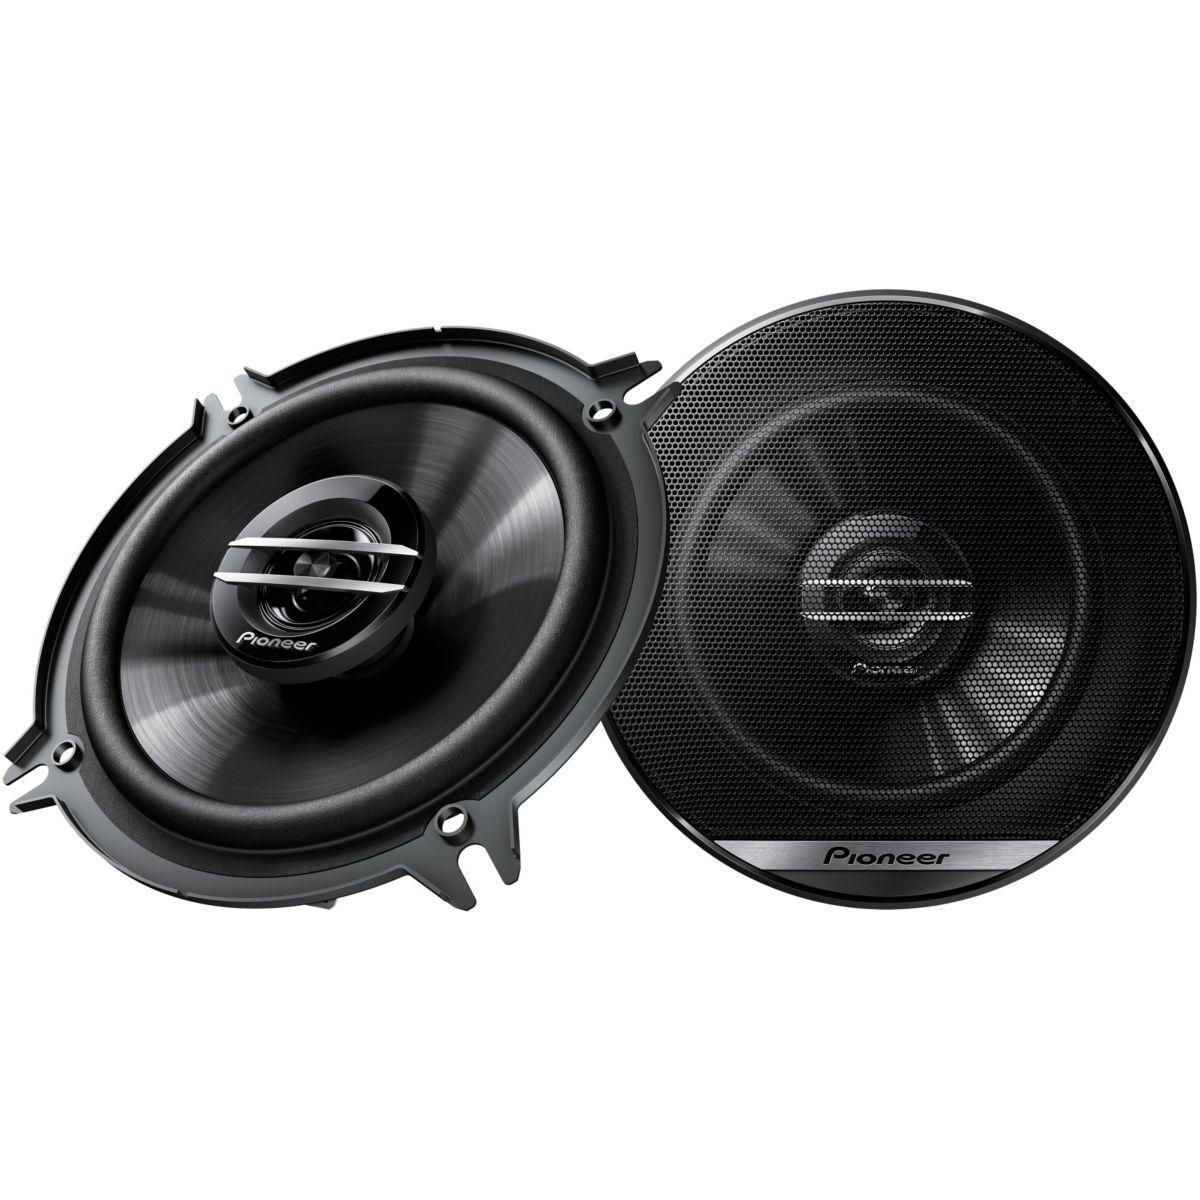 Haut-parleur pioneer 2 voies diam 130 ts-g1320f